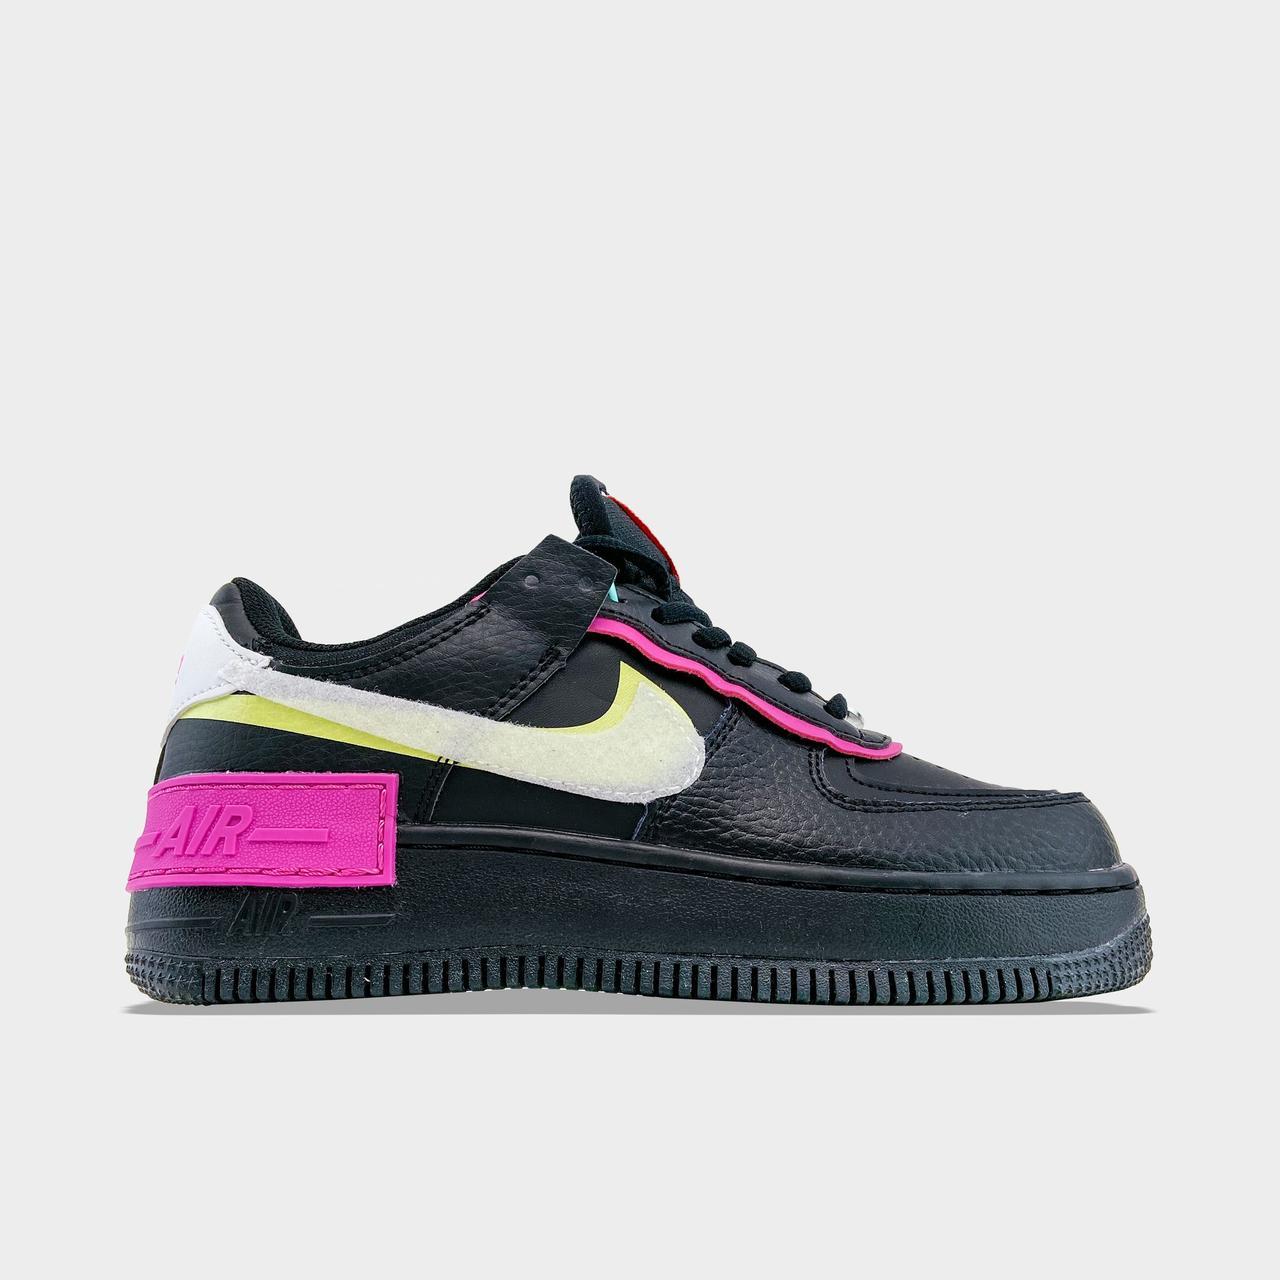 Nk, крос, обувь, взуття, sneakers, шузы, Air Force 1 Shadow Low Removable (Черный)